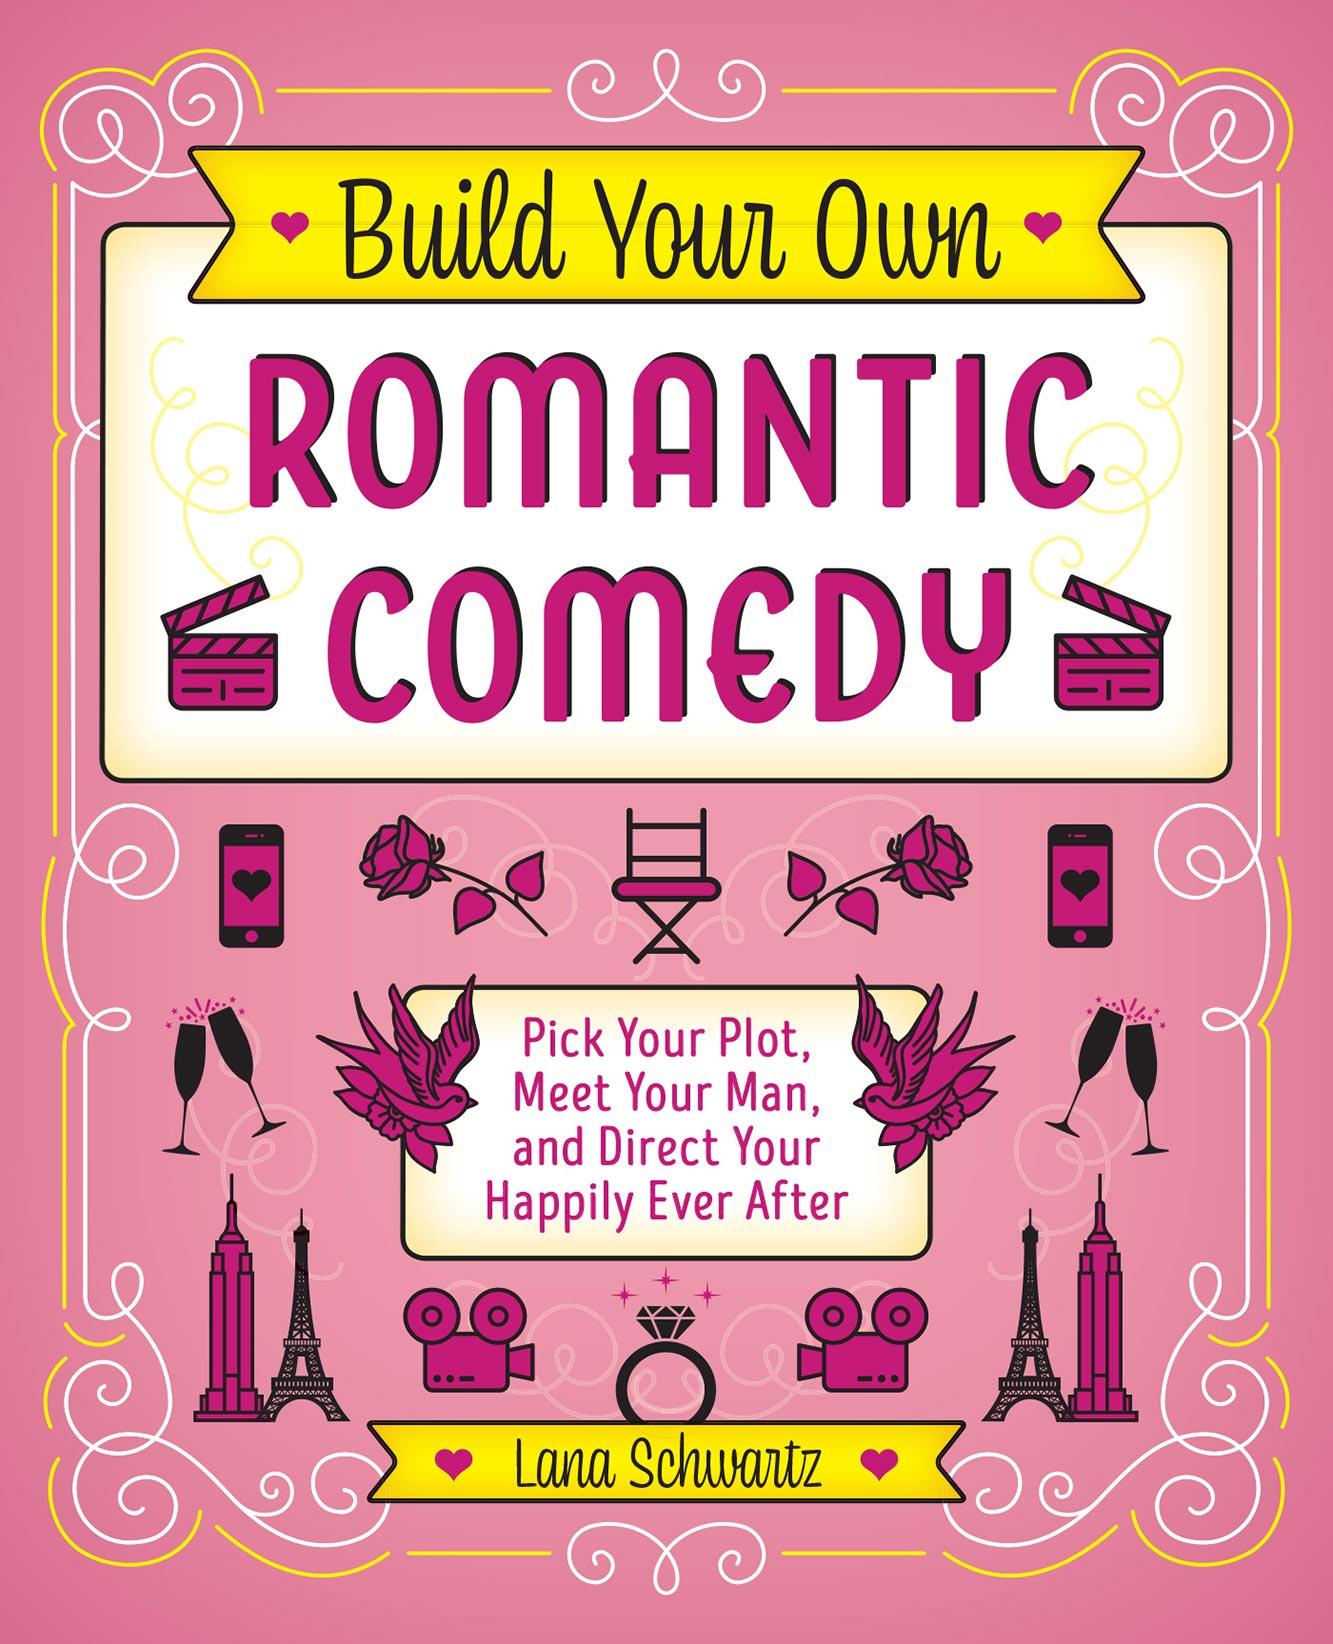 2021 Valentine's Gift Guide